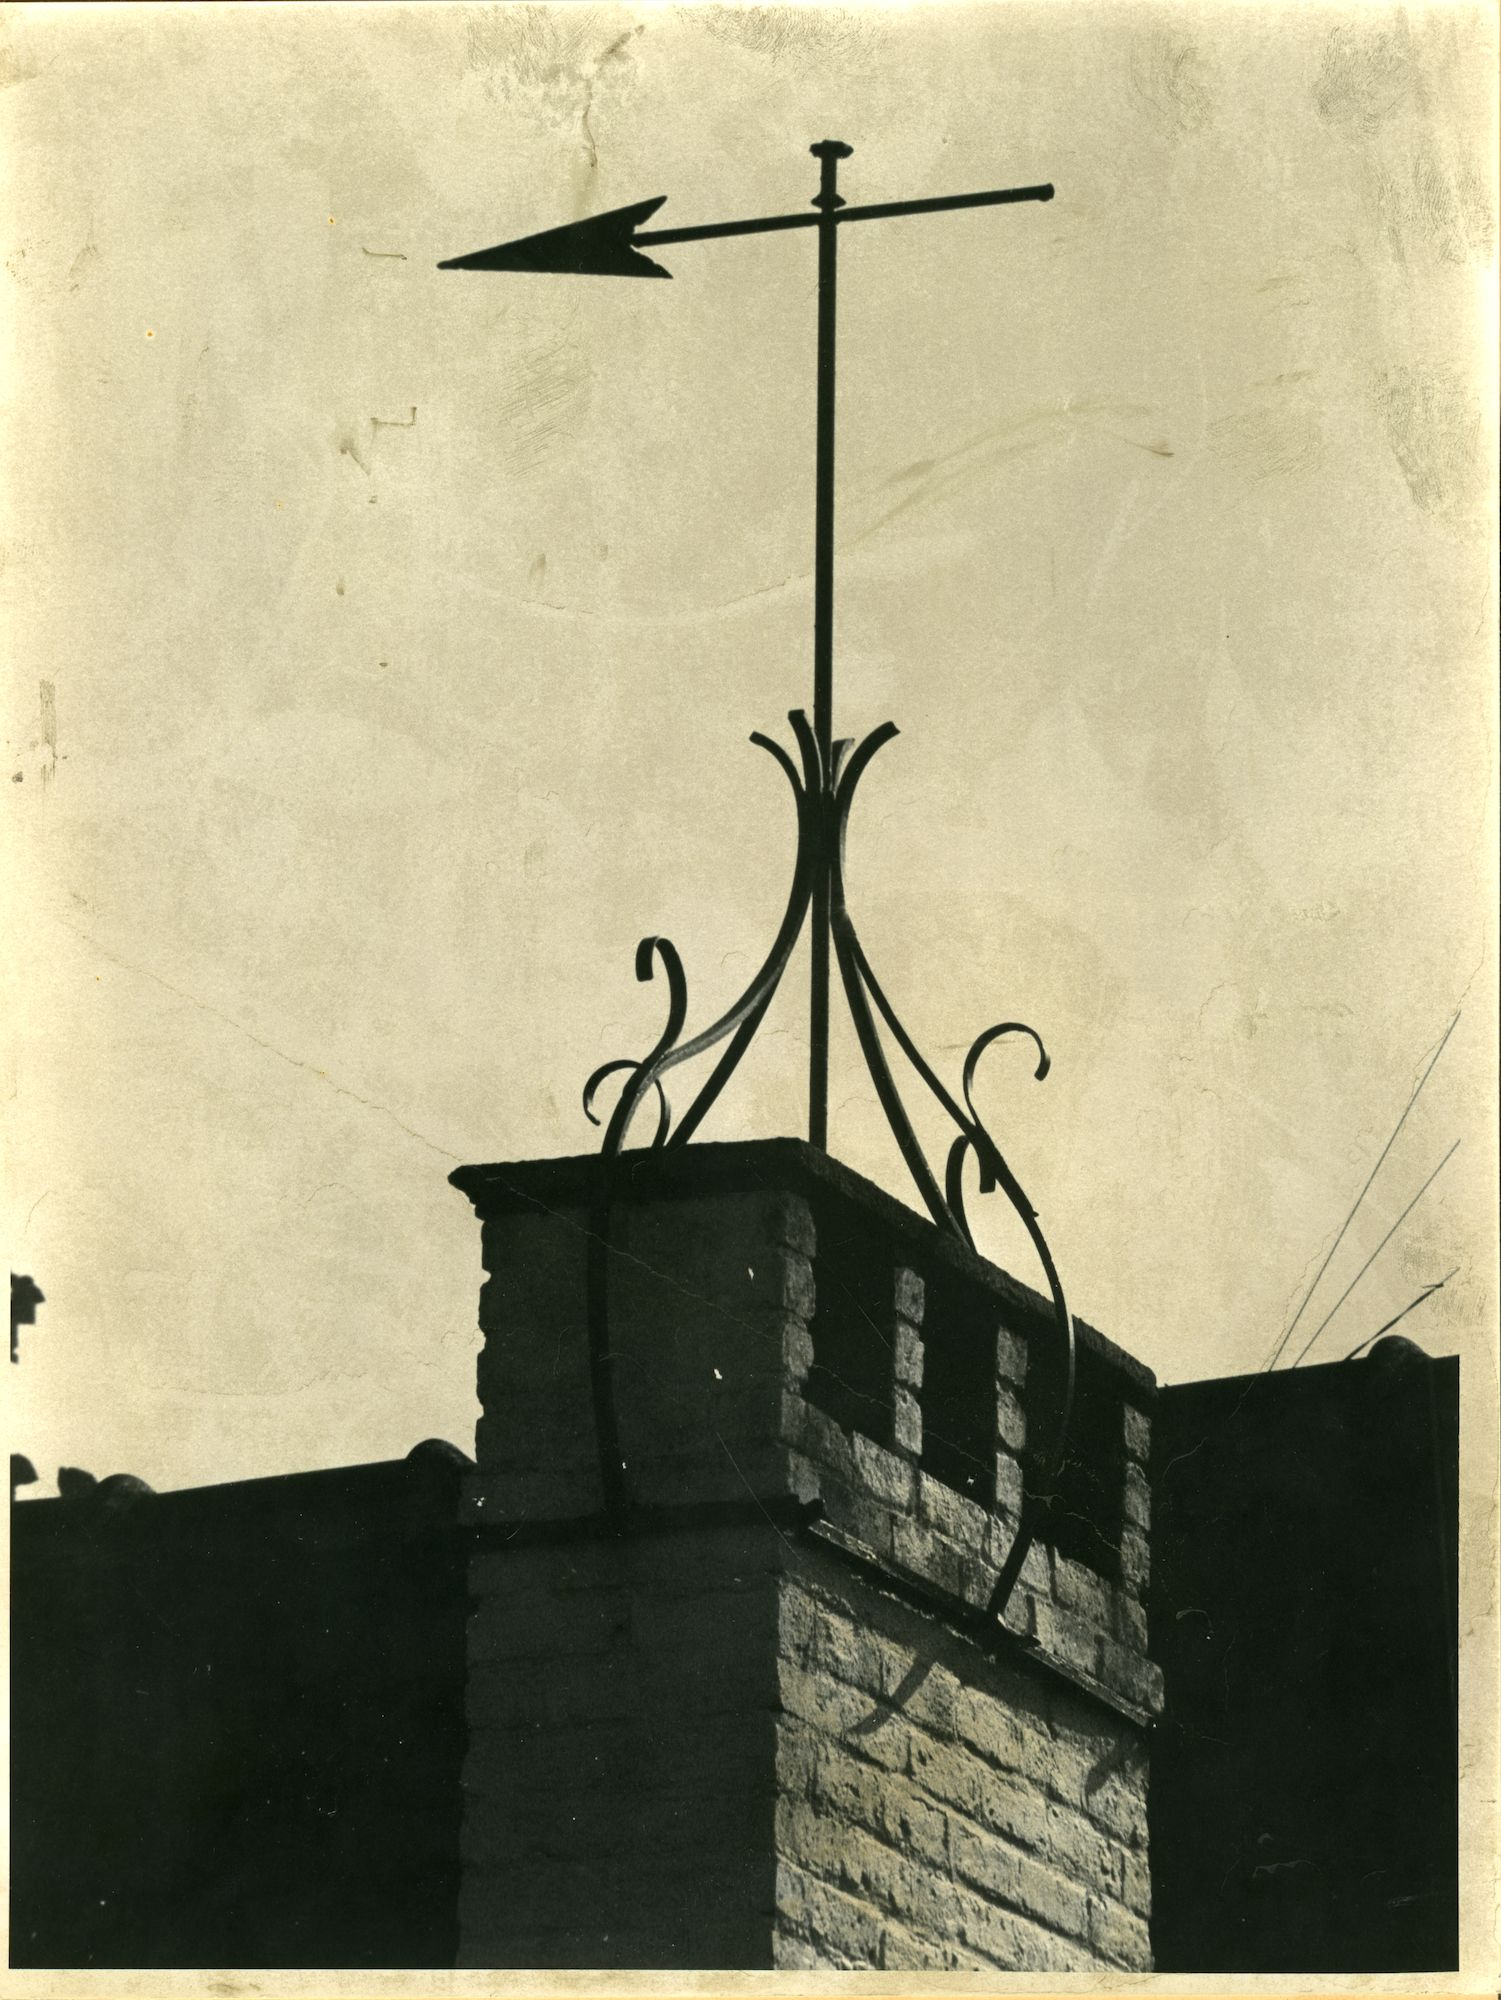 Oostakker: Katoenstraat 33: Nokversiering, 1979